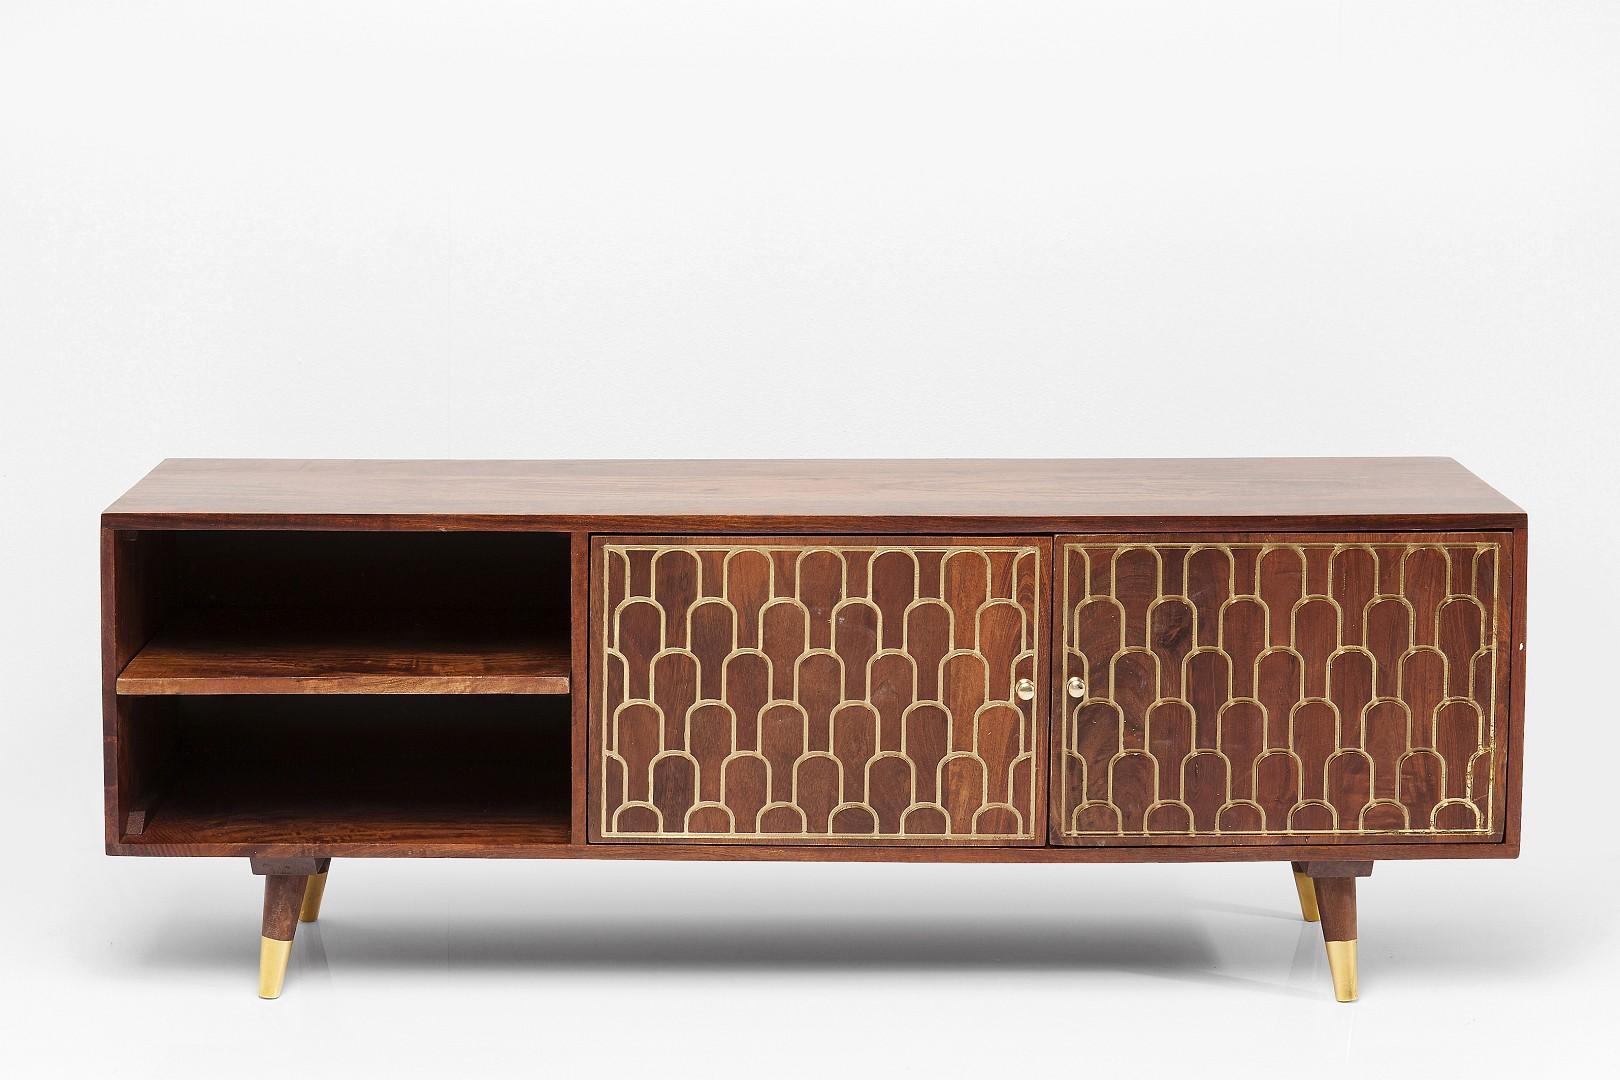 kommoden sideboards im freudenhaus online shop kaufen. Black Bedroom Furniture Sets. Home Design Ideas